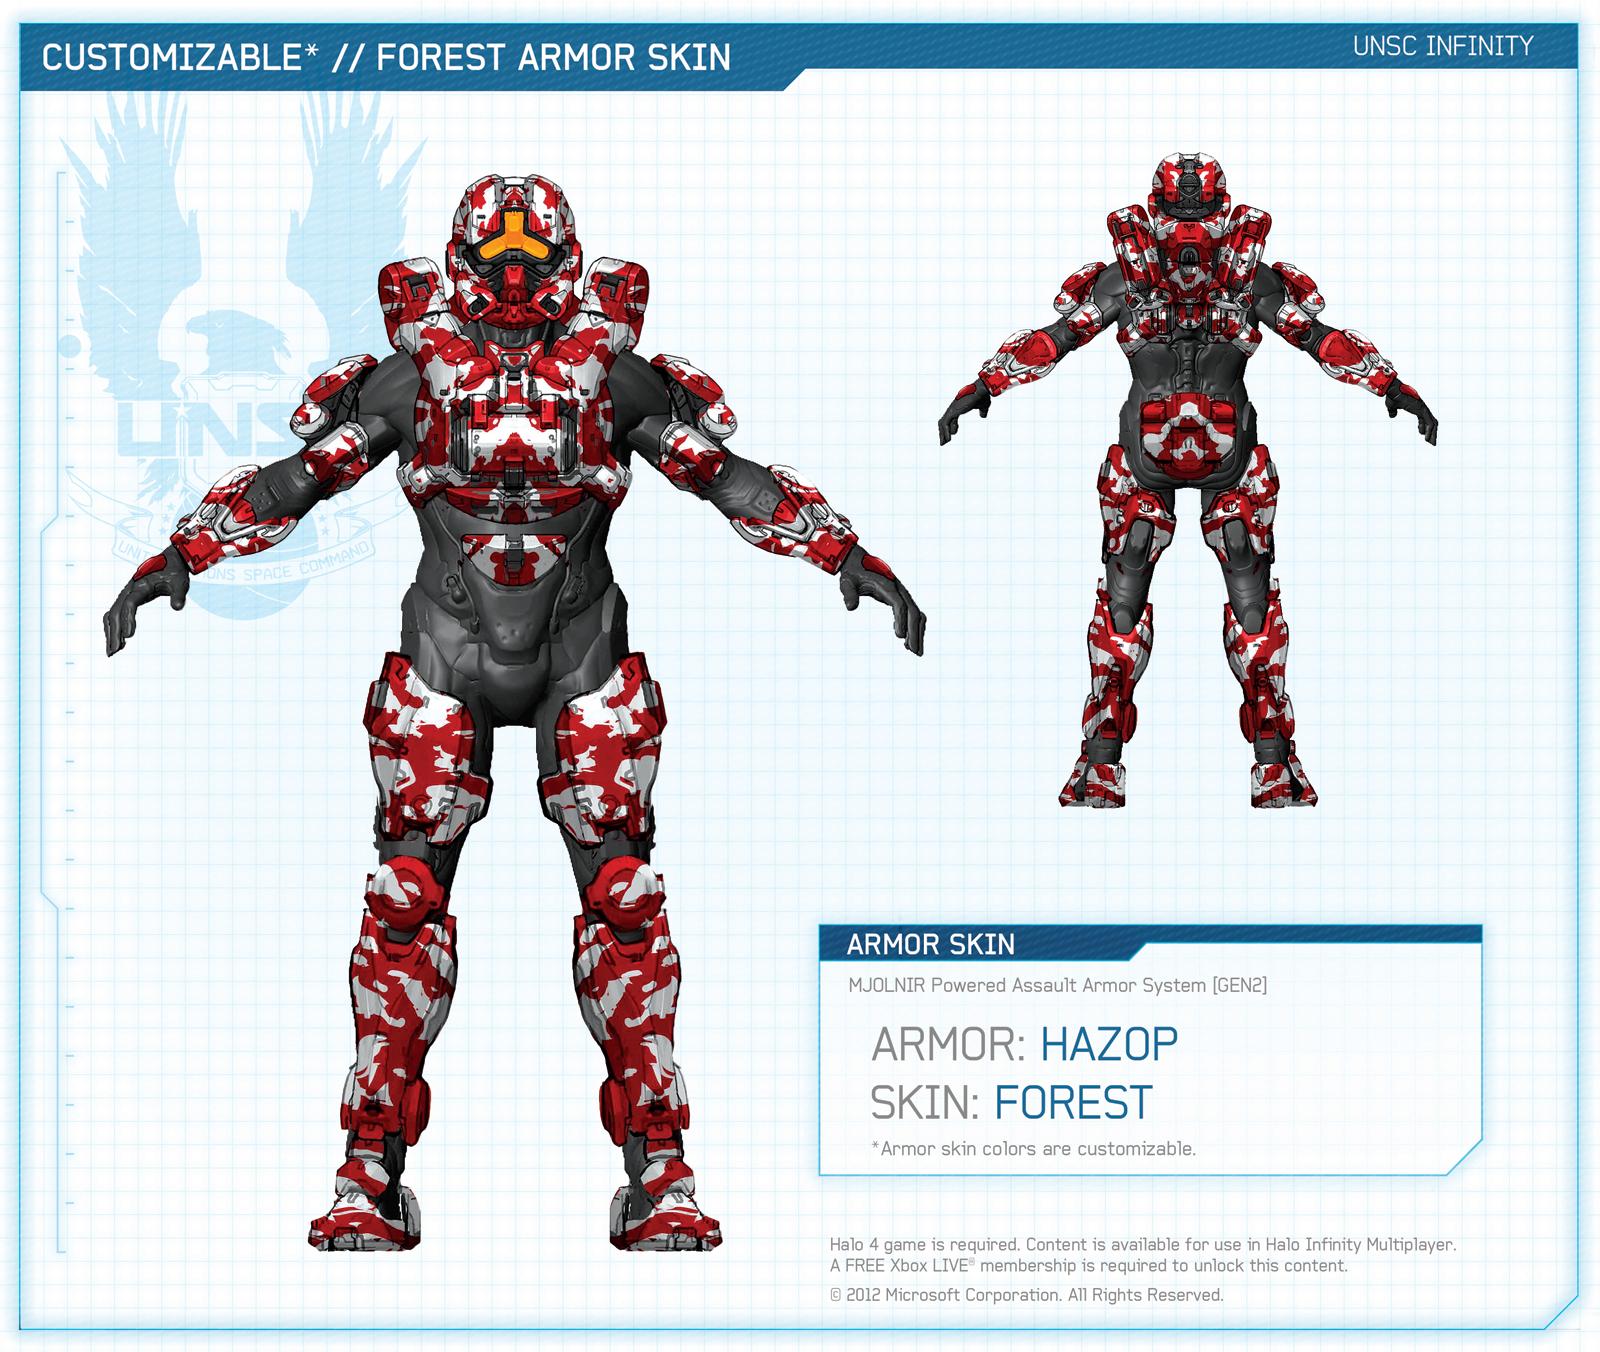 Halo 4 - Halo 4 Арт